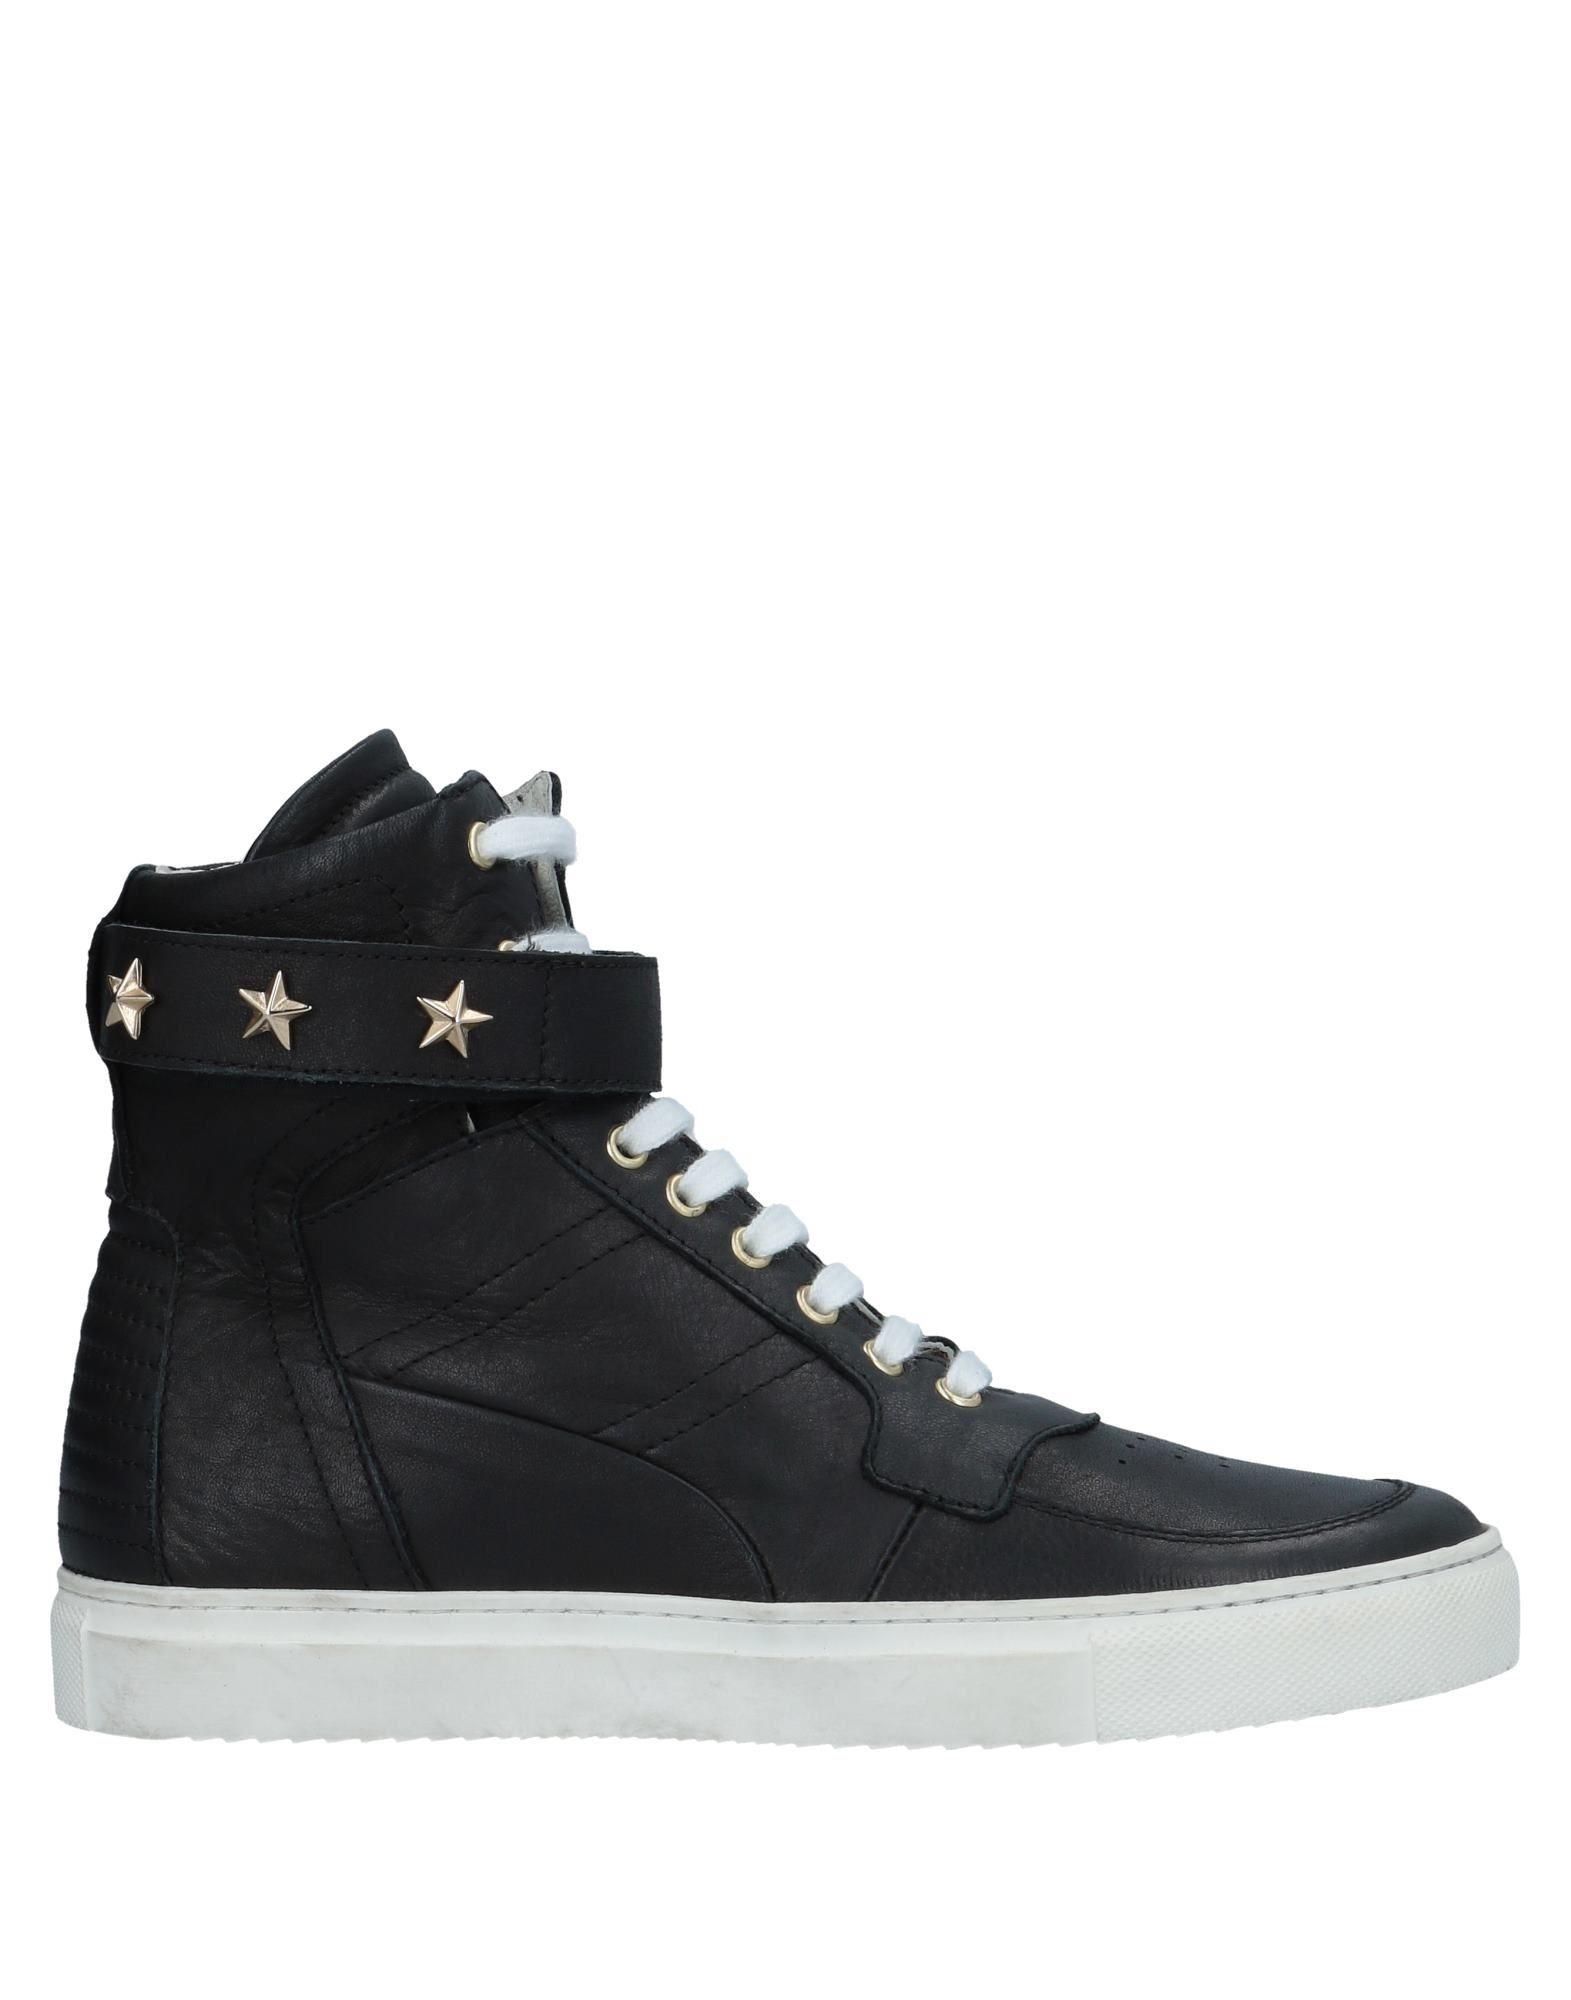 Moda Sneakers Lea-Gu Lea-Gu Sneakers Donna - 11526023KA 480ff6